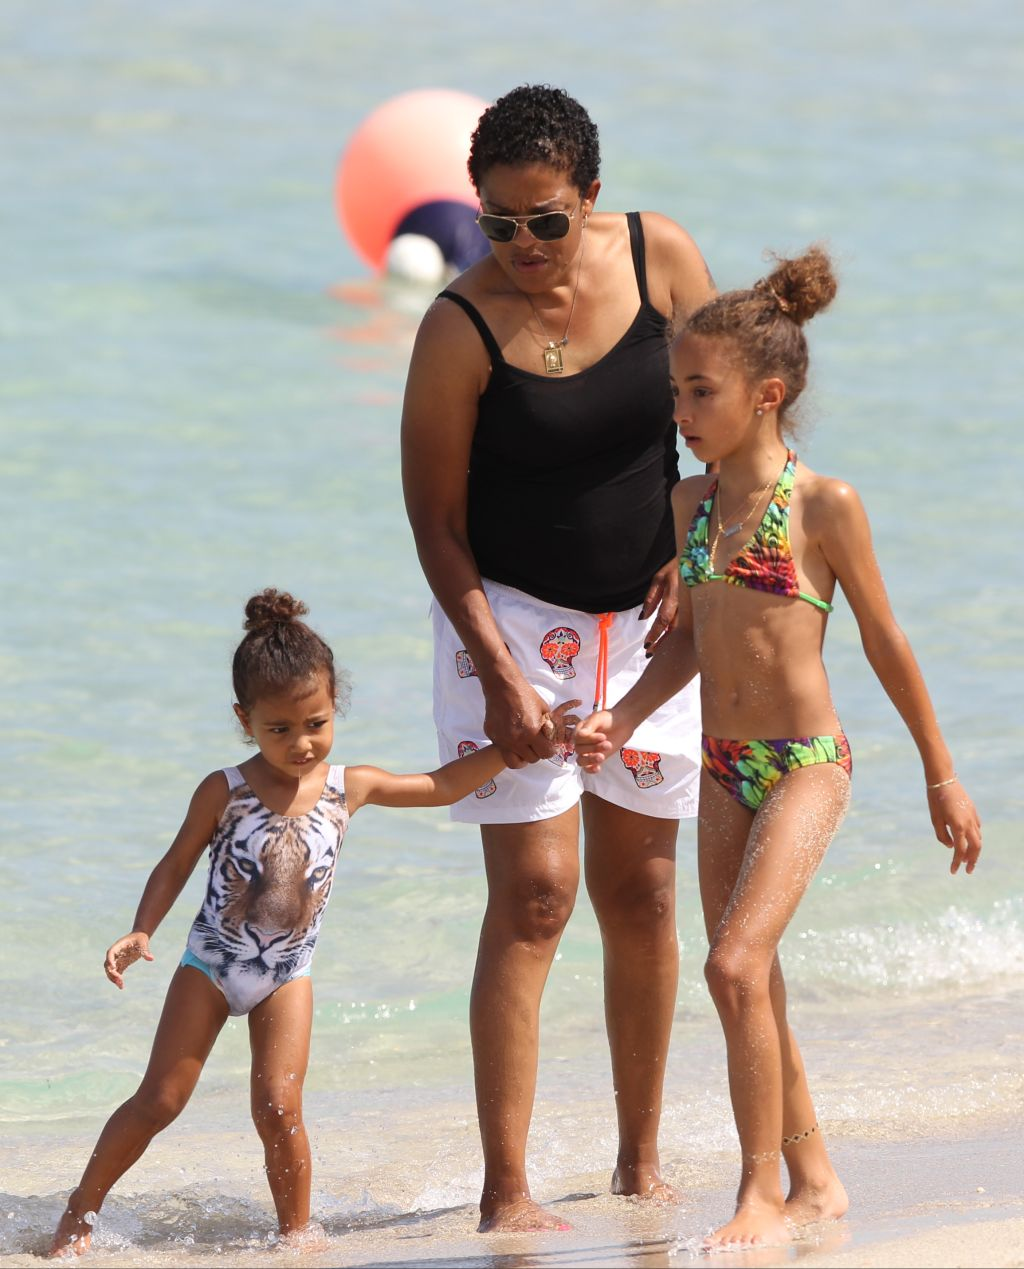 Kim Kardashian, North West, Kanye West, Kourtney Kardashian, Penelope Disick in Miami